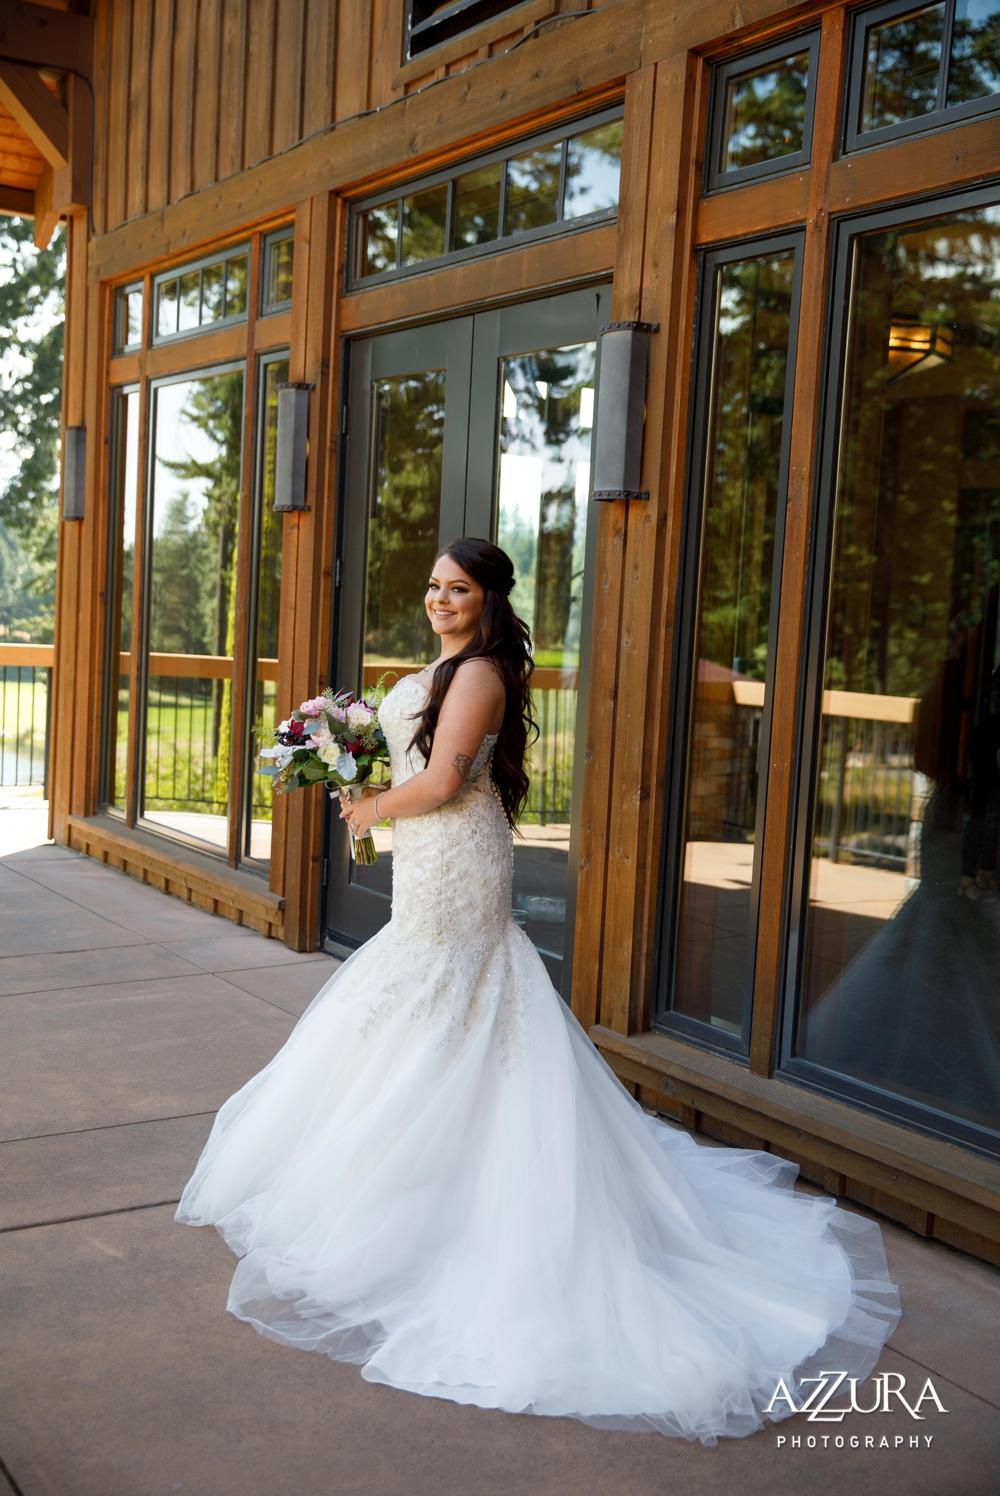 bride-with-bouquet-looking-over-her-shoulder